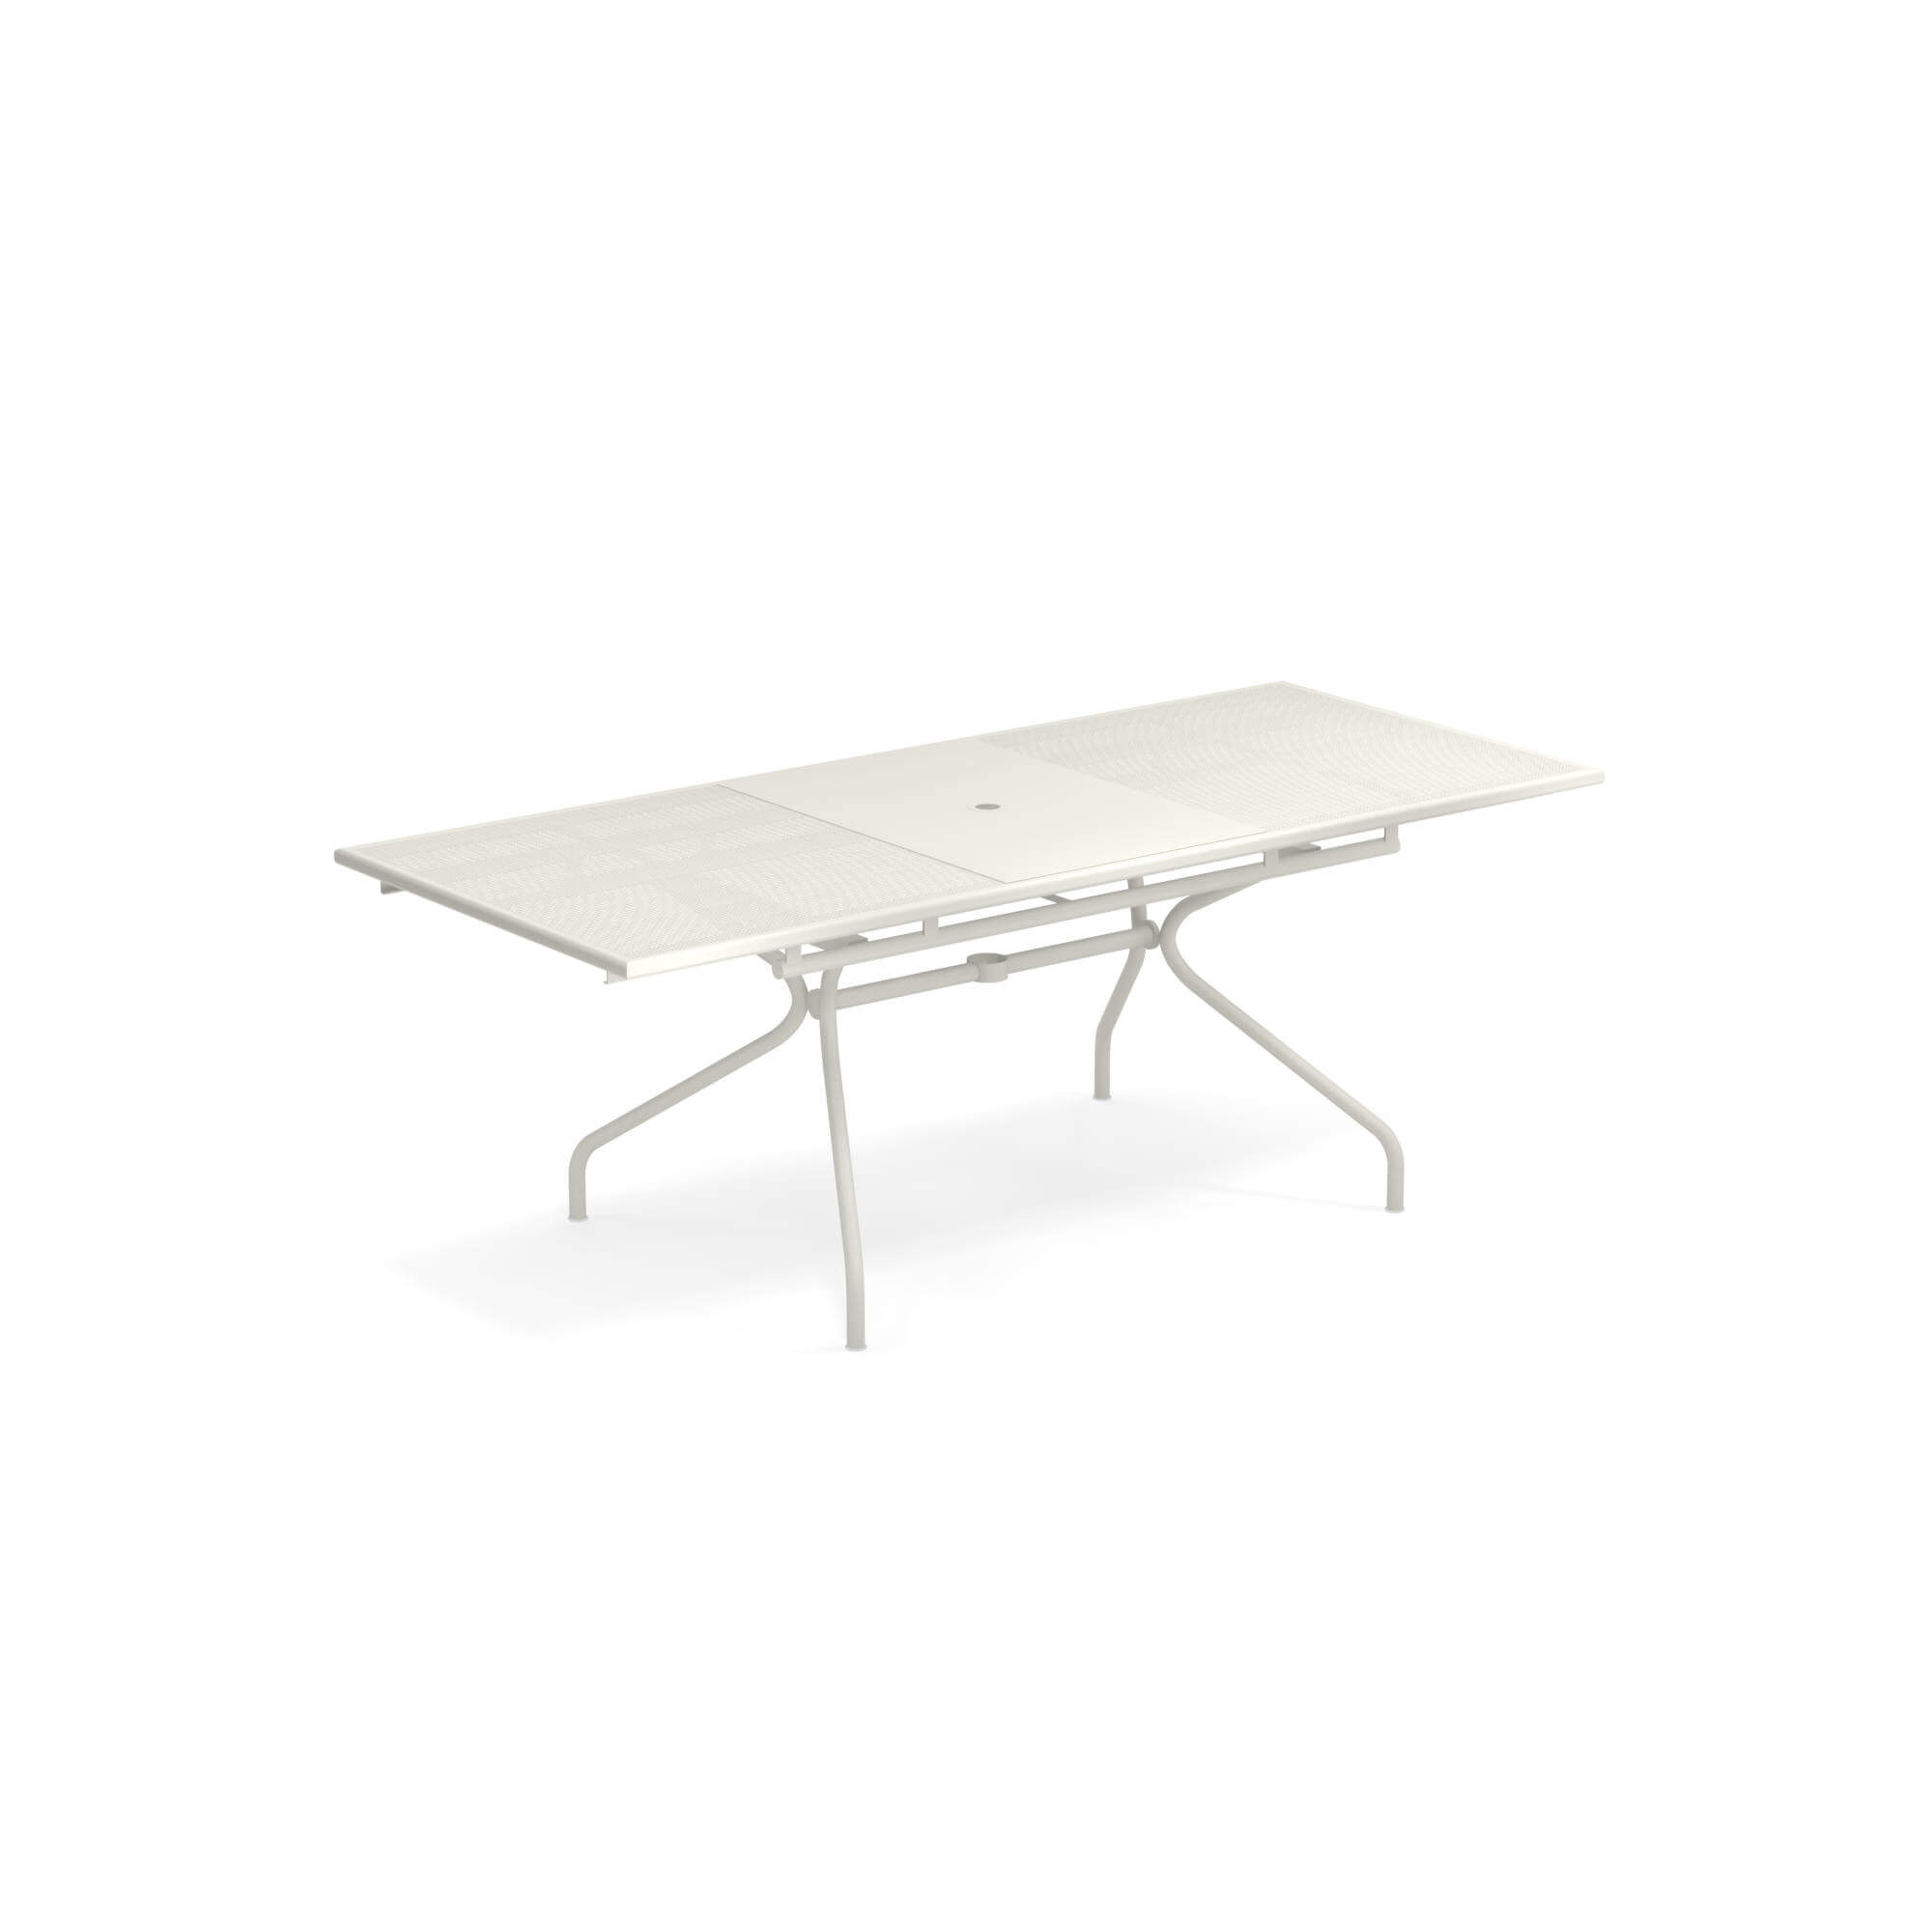 promo tavolo athena bianco di emu